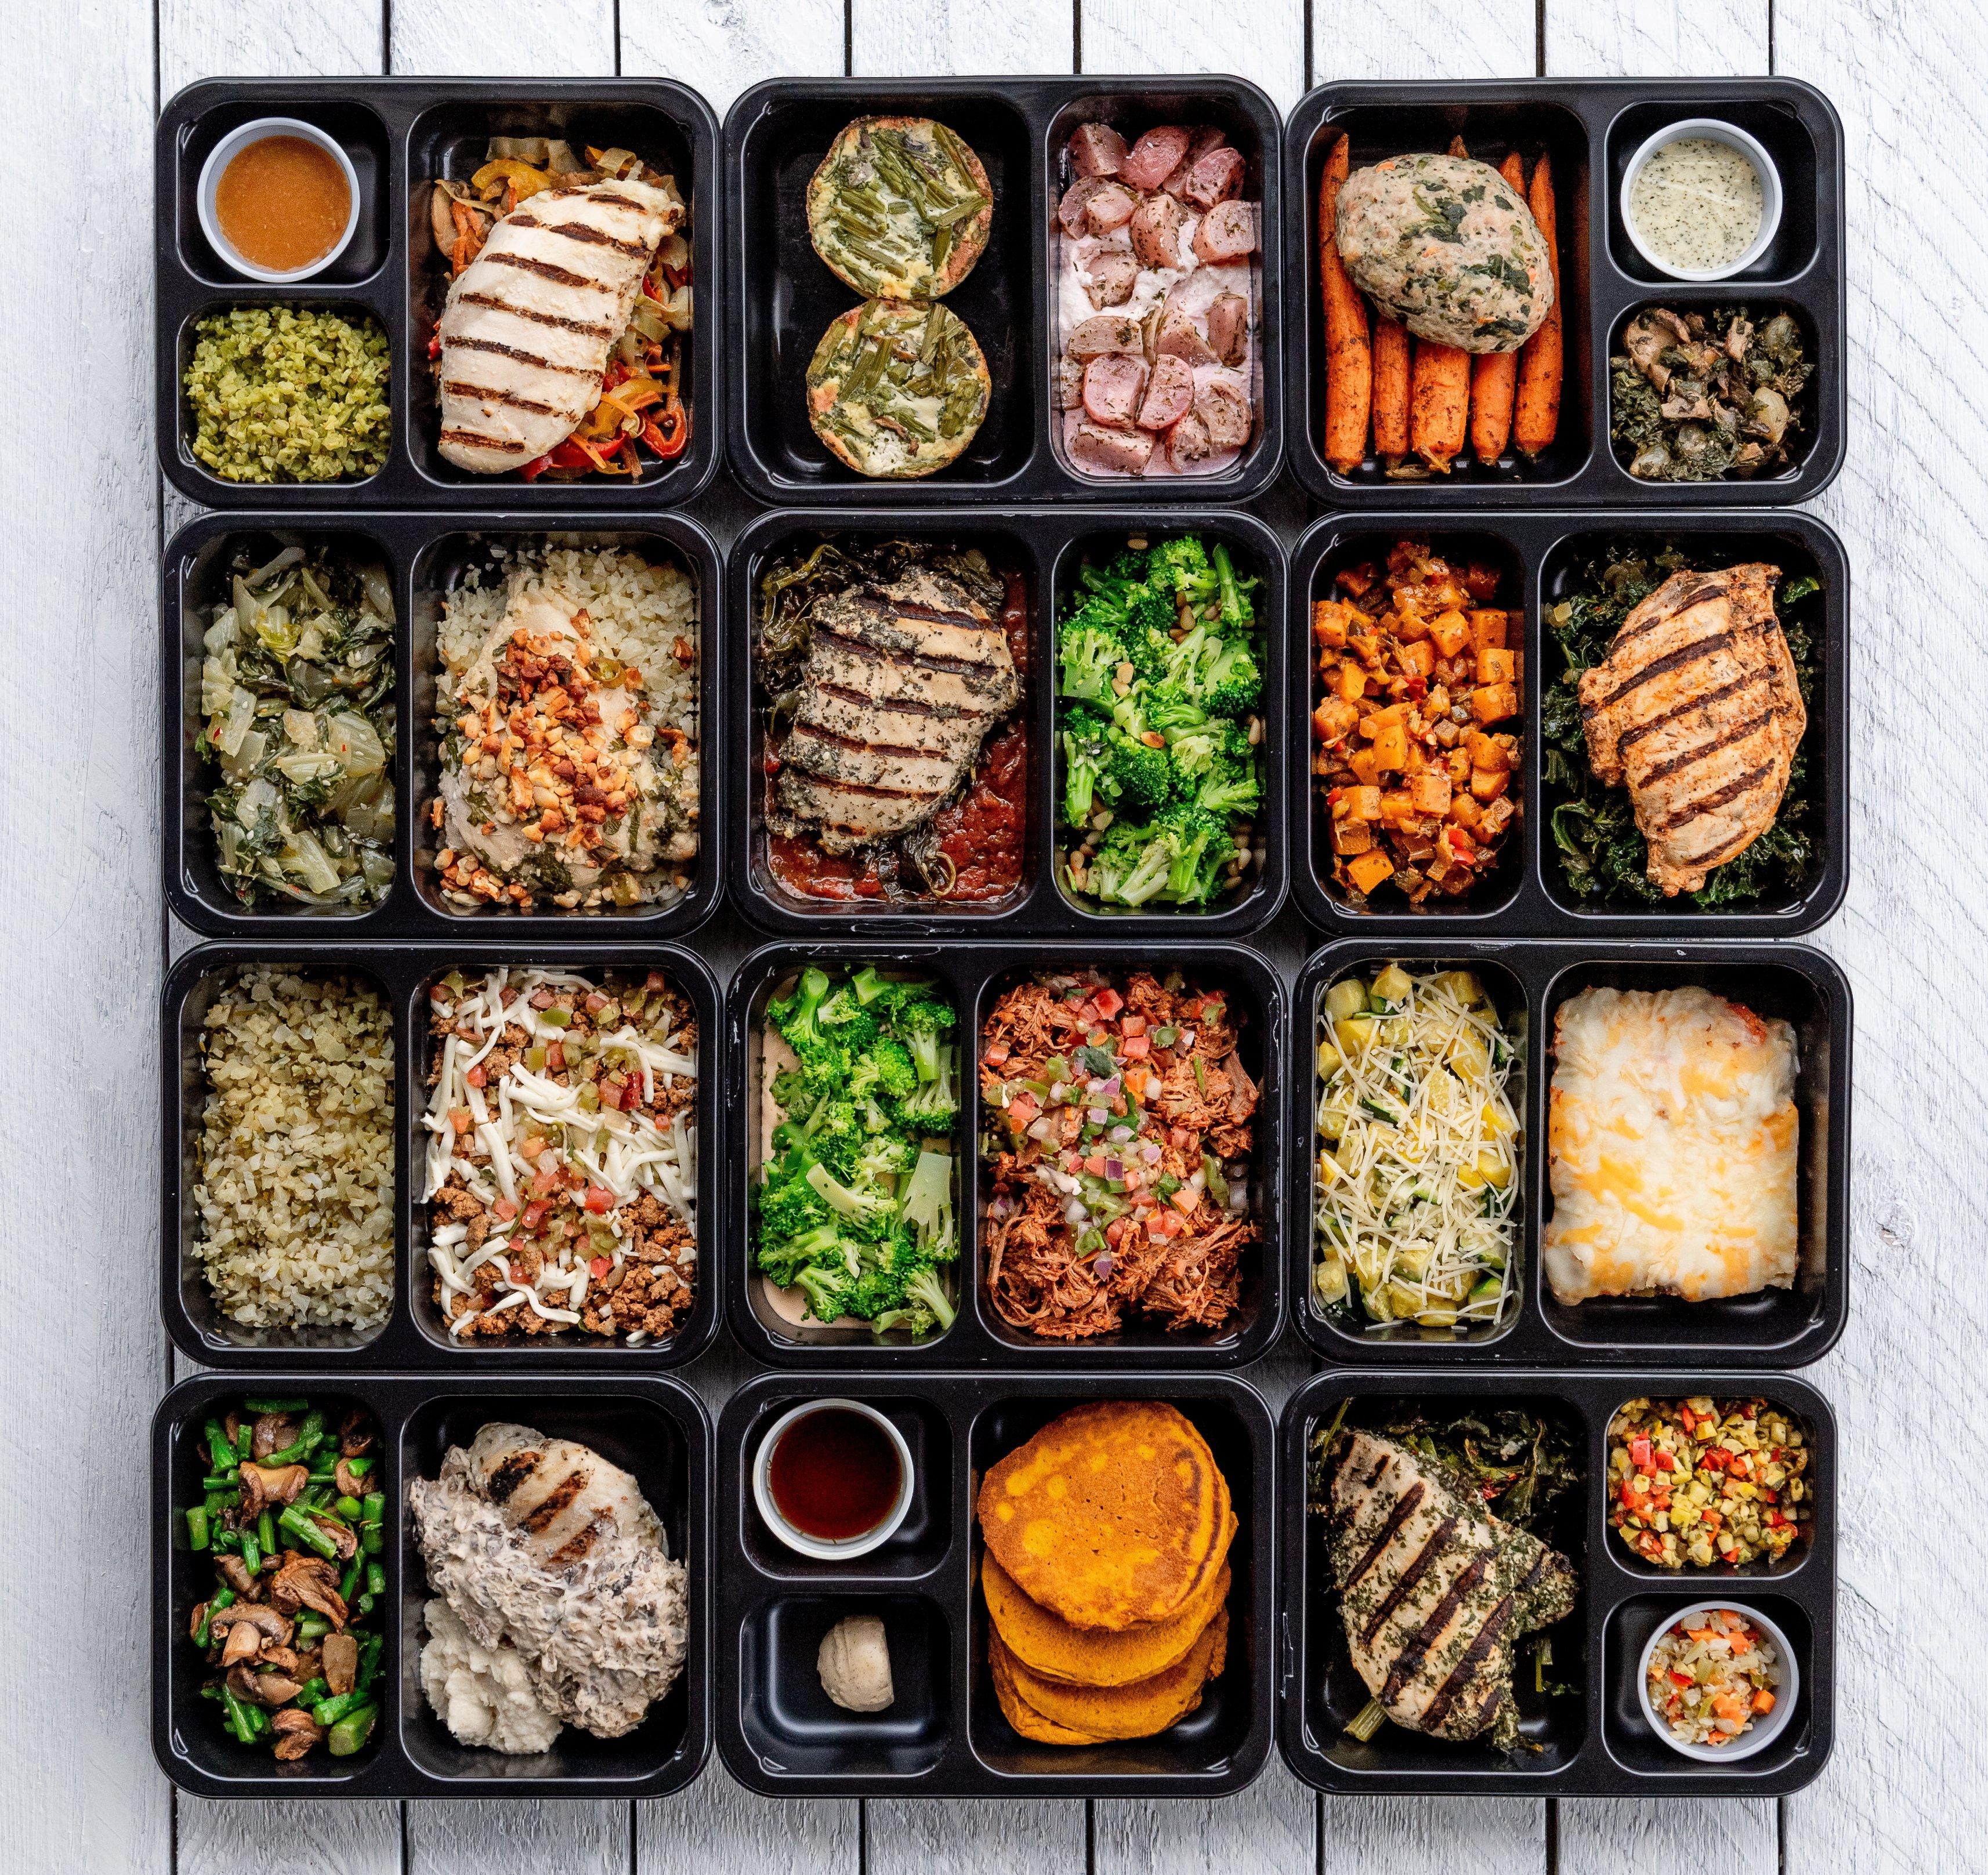 Factor-75-Meals-Turkey-Ragu-Zucchini-Bowl-3378